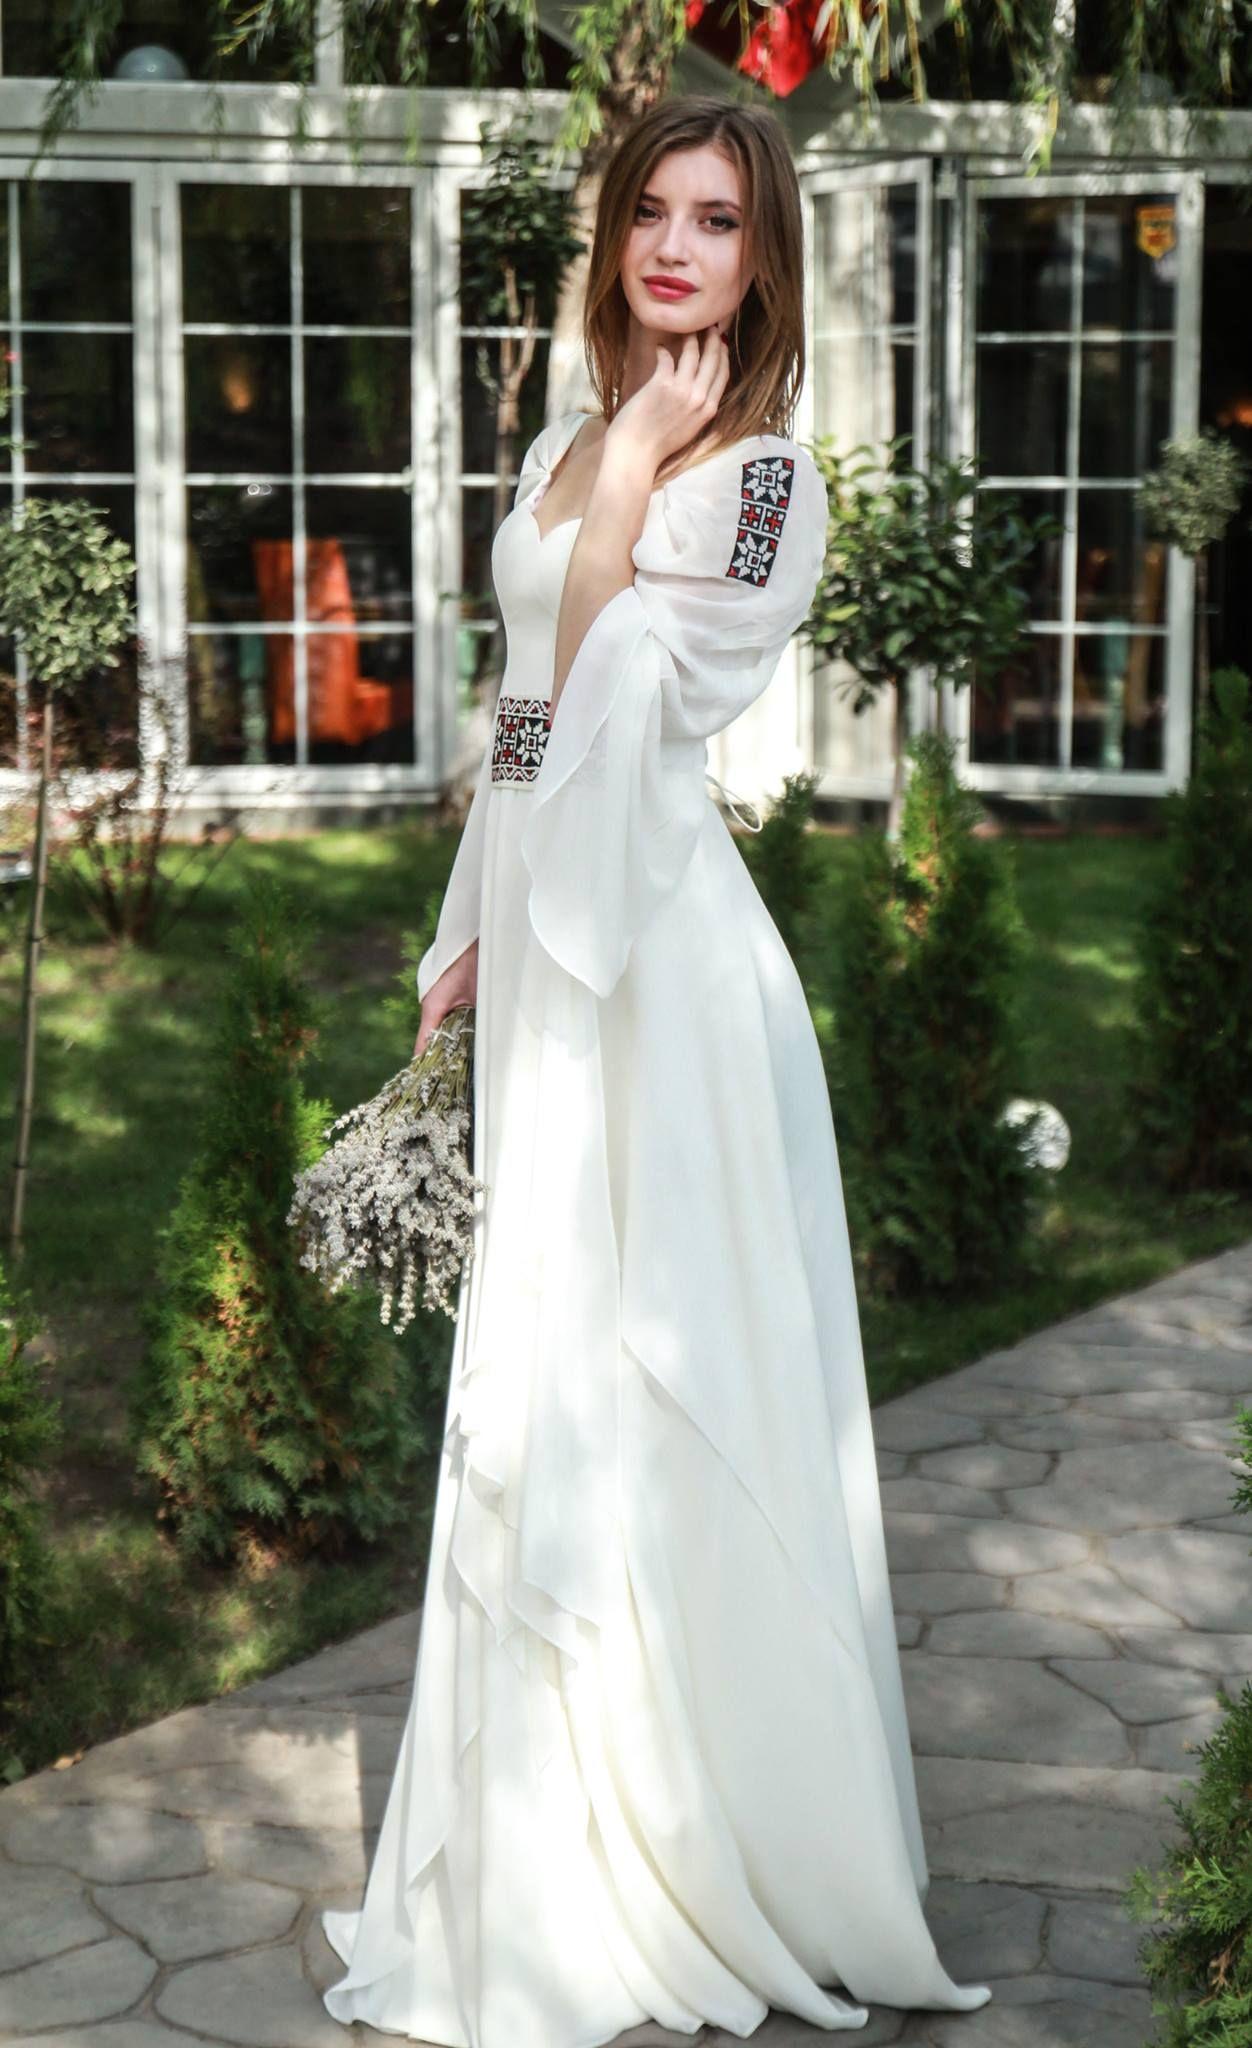 Rochie De Mireasa Catrina In 2019 Hm Formal Dresses Dresses